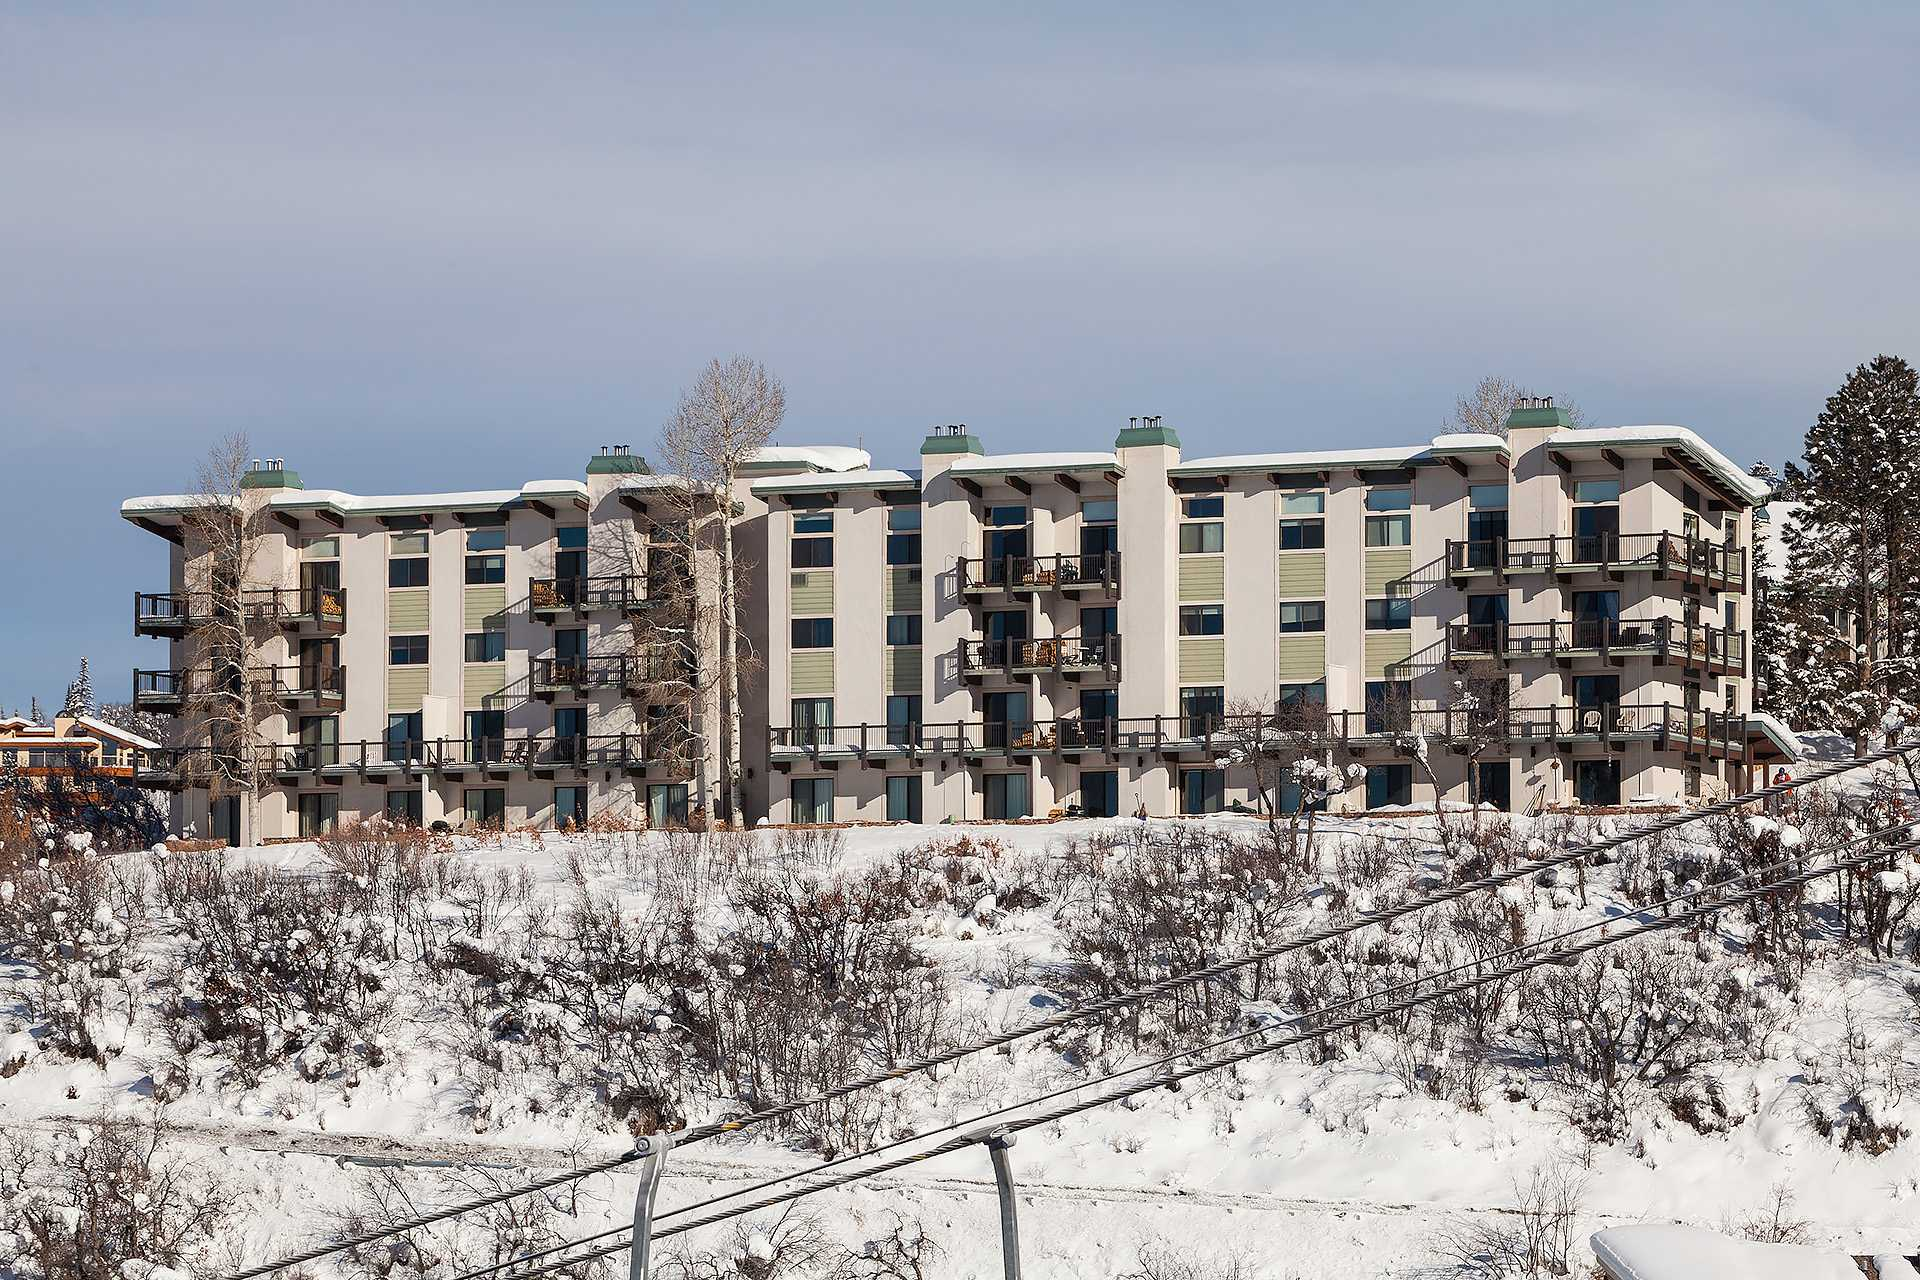 CC313: Storm Meadows Club C Condominiums